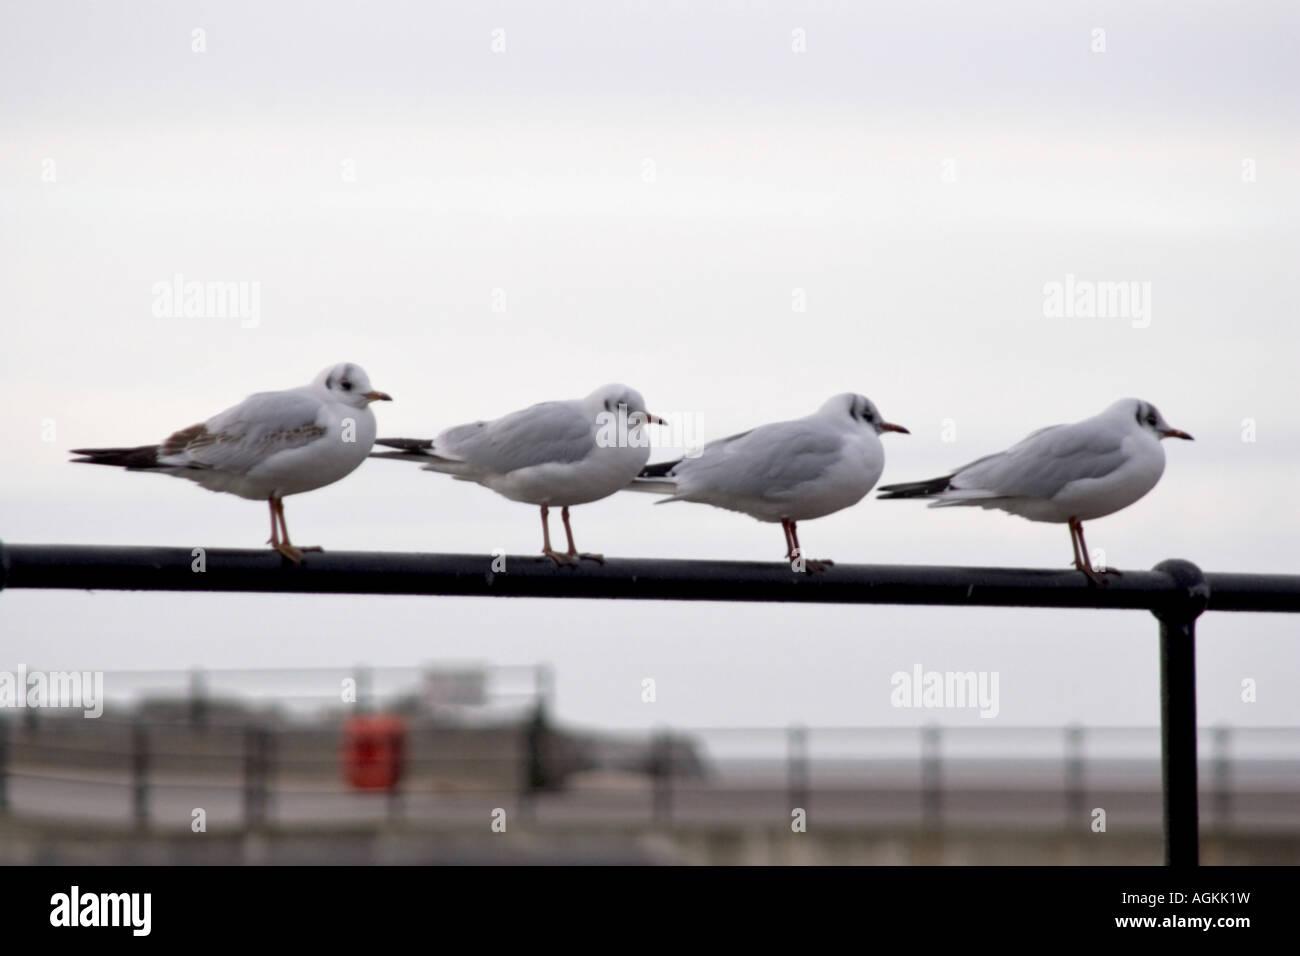 4 gulls on a rail - Stock Image